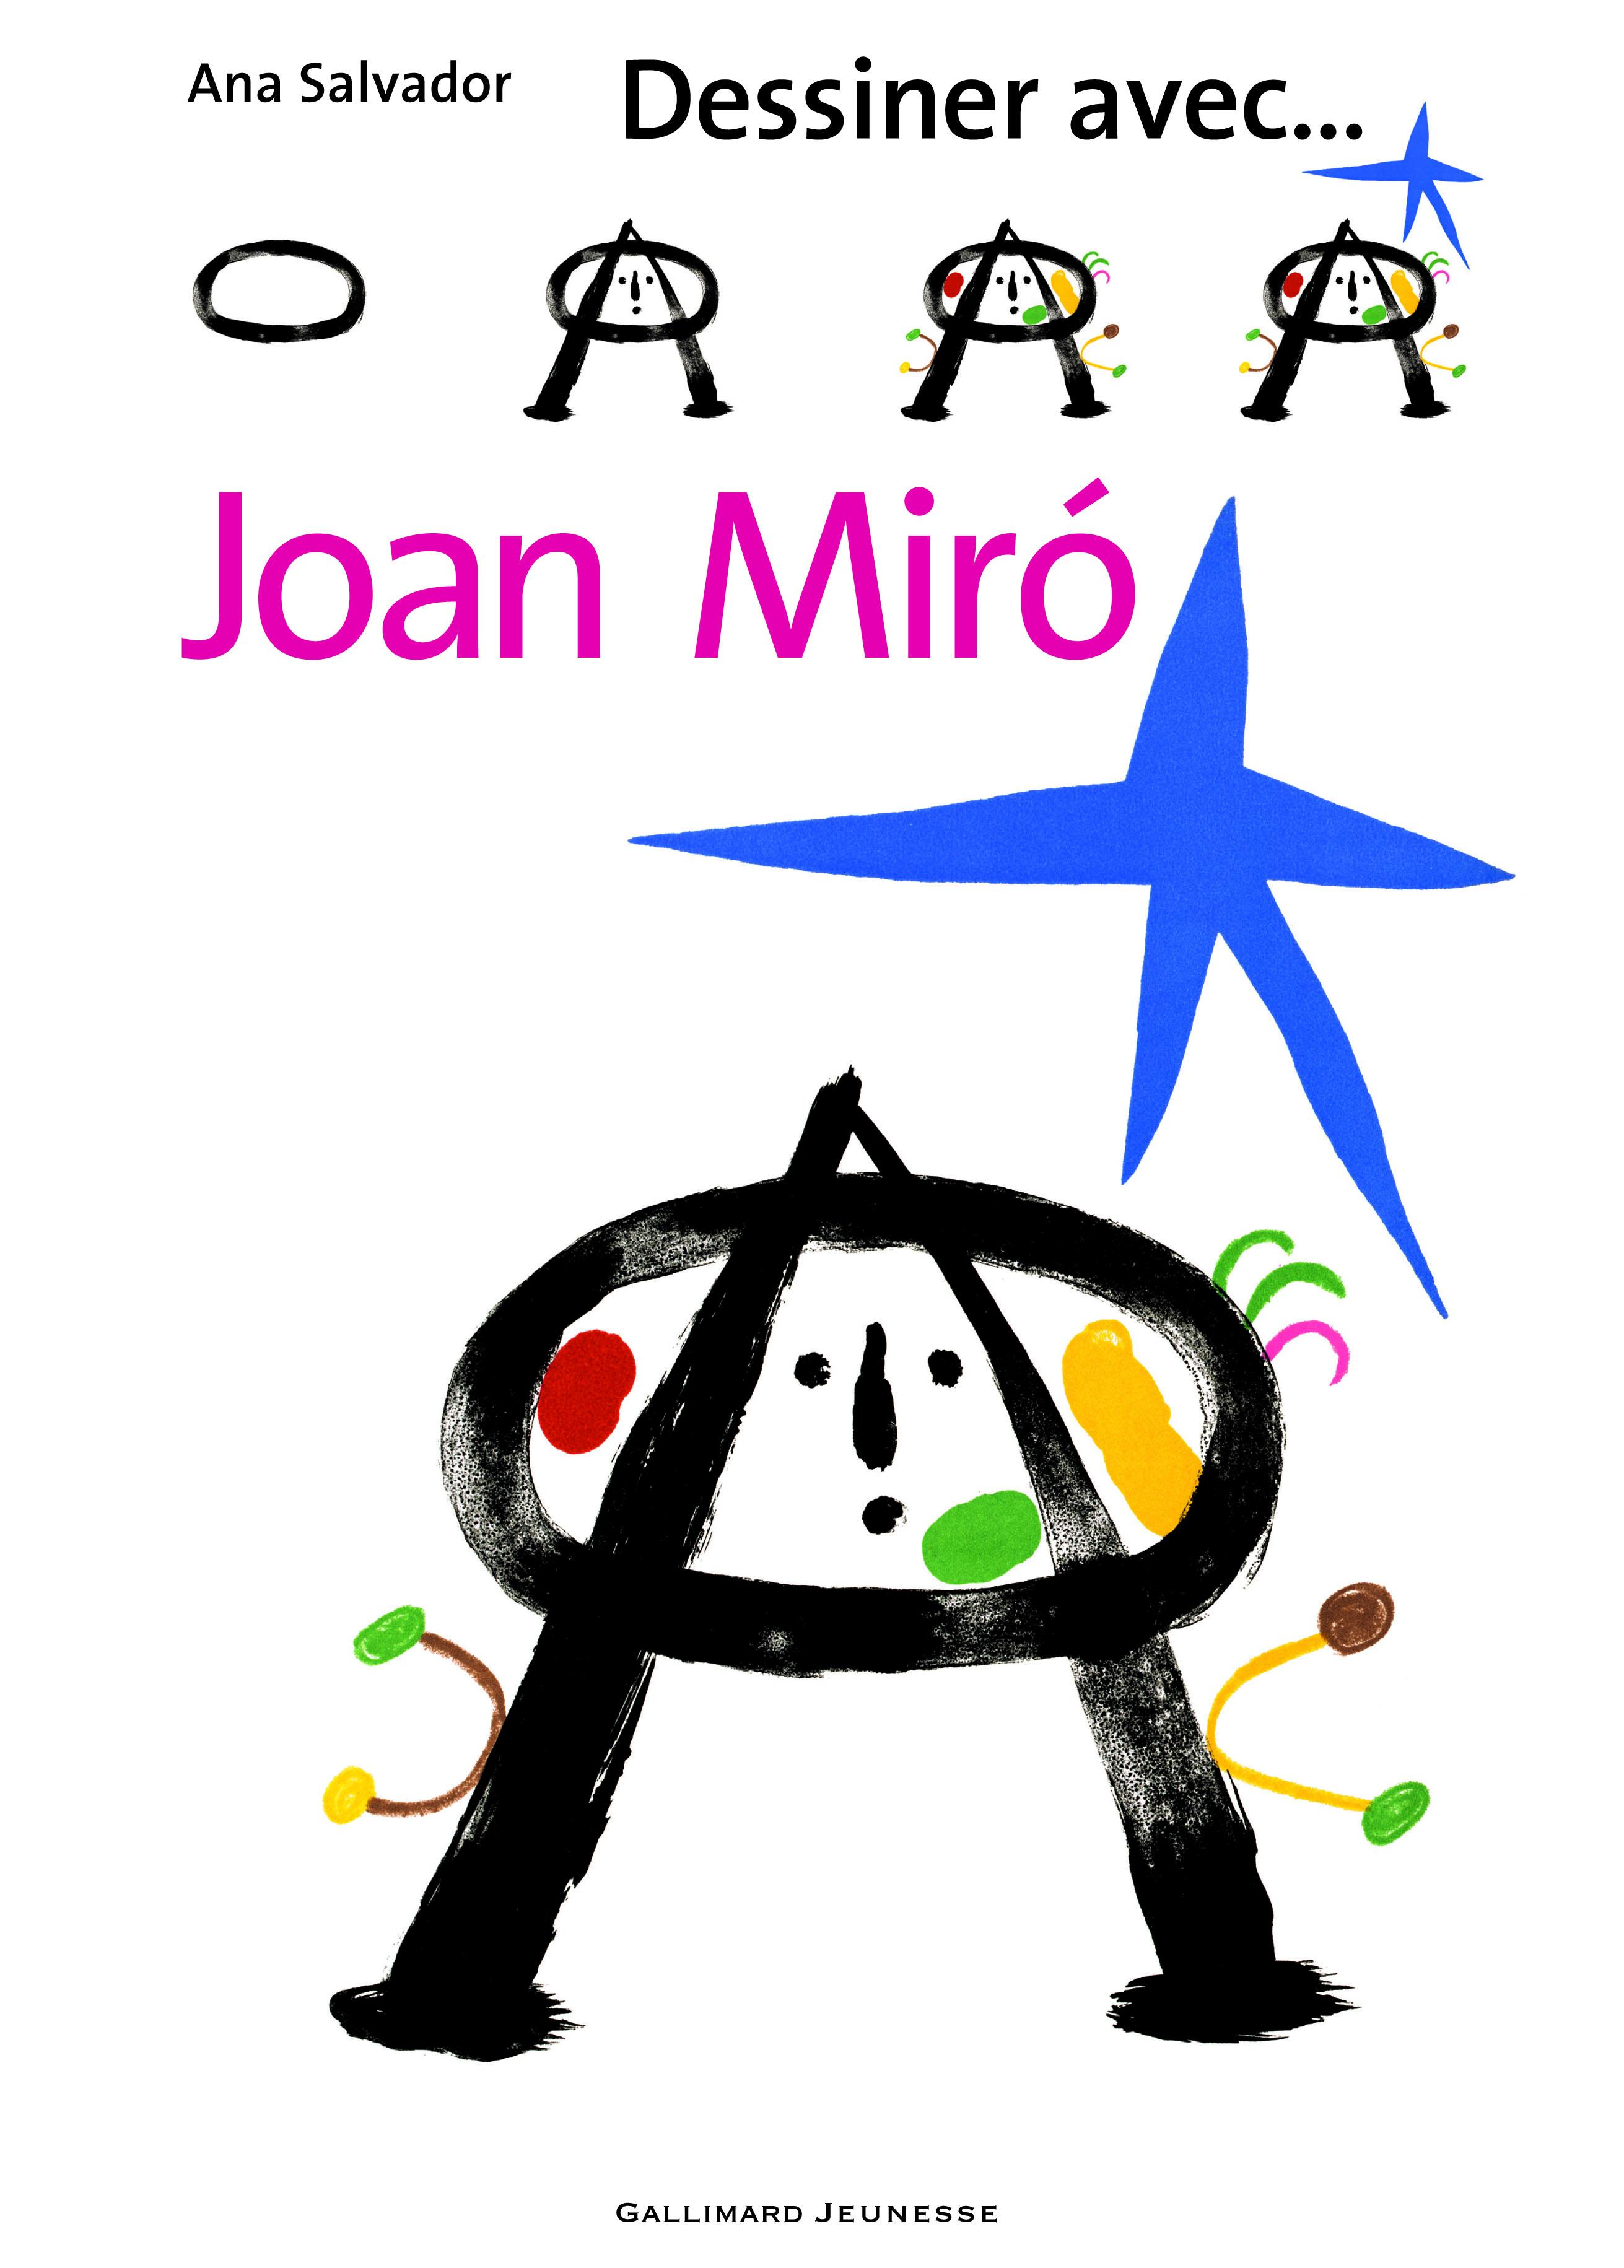 Dessiner Avec Joan Miro Dessiner Avec Gallimard Jeunesse Site Gallimard